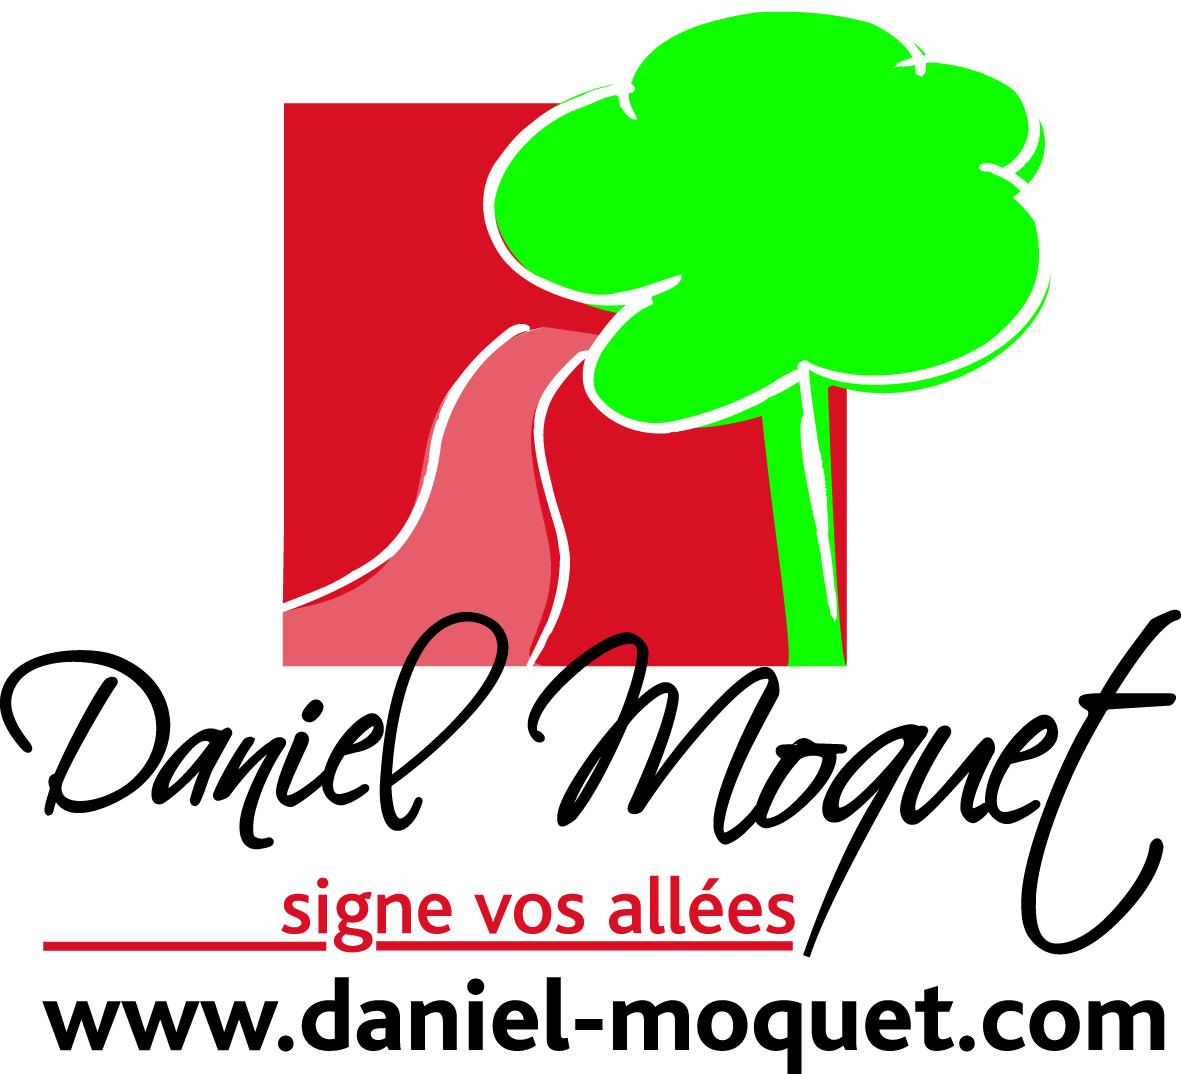 Daniel Moquet Signe Vos Allees Ent Perrey Paysagistes